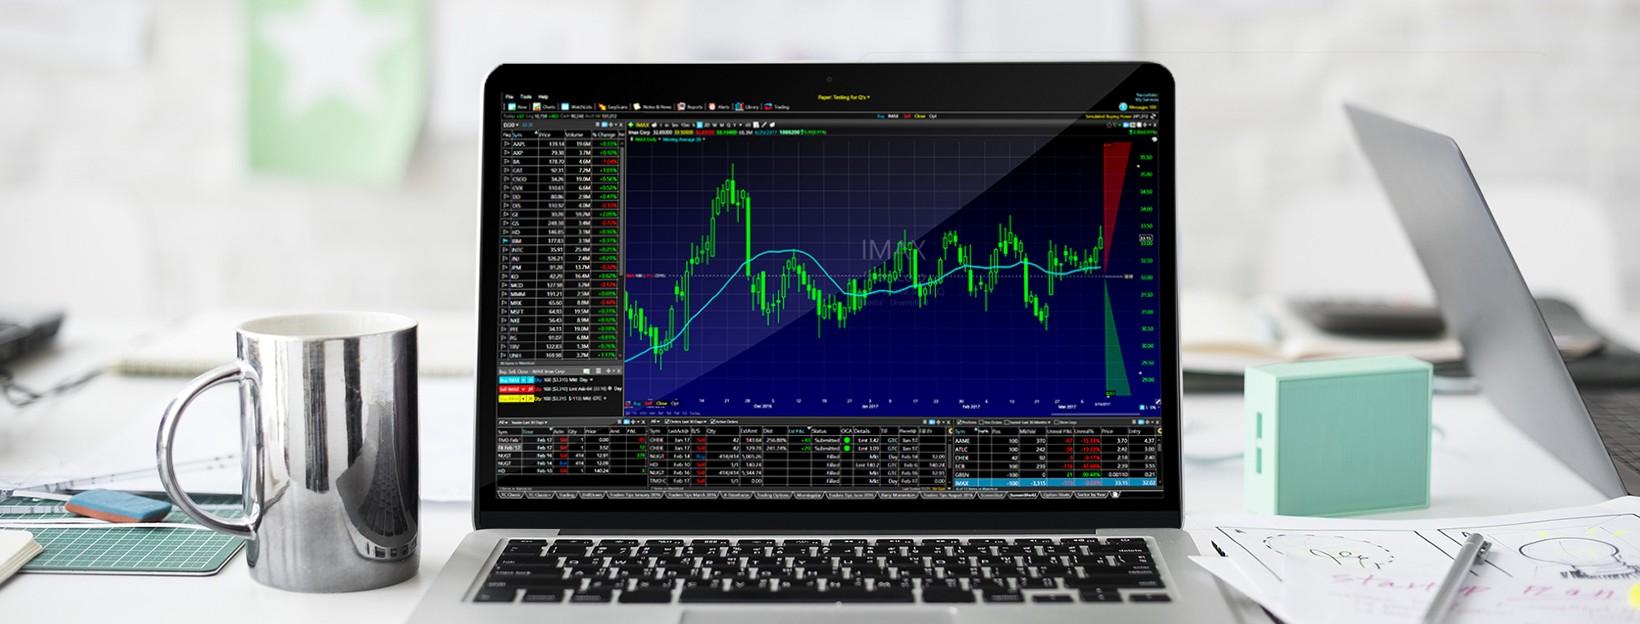 TC2000 Trading | LinkedIn